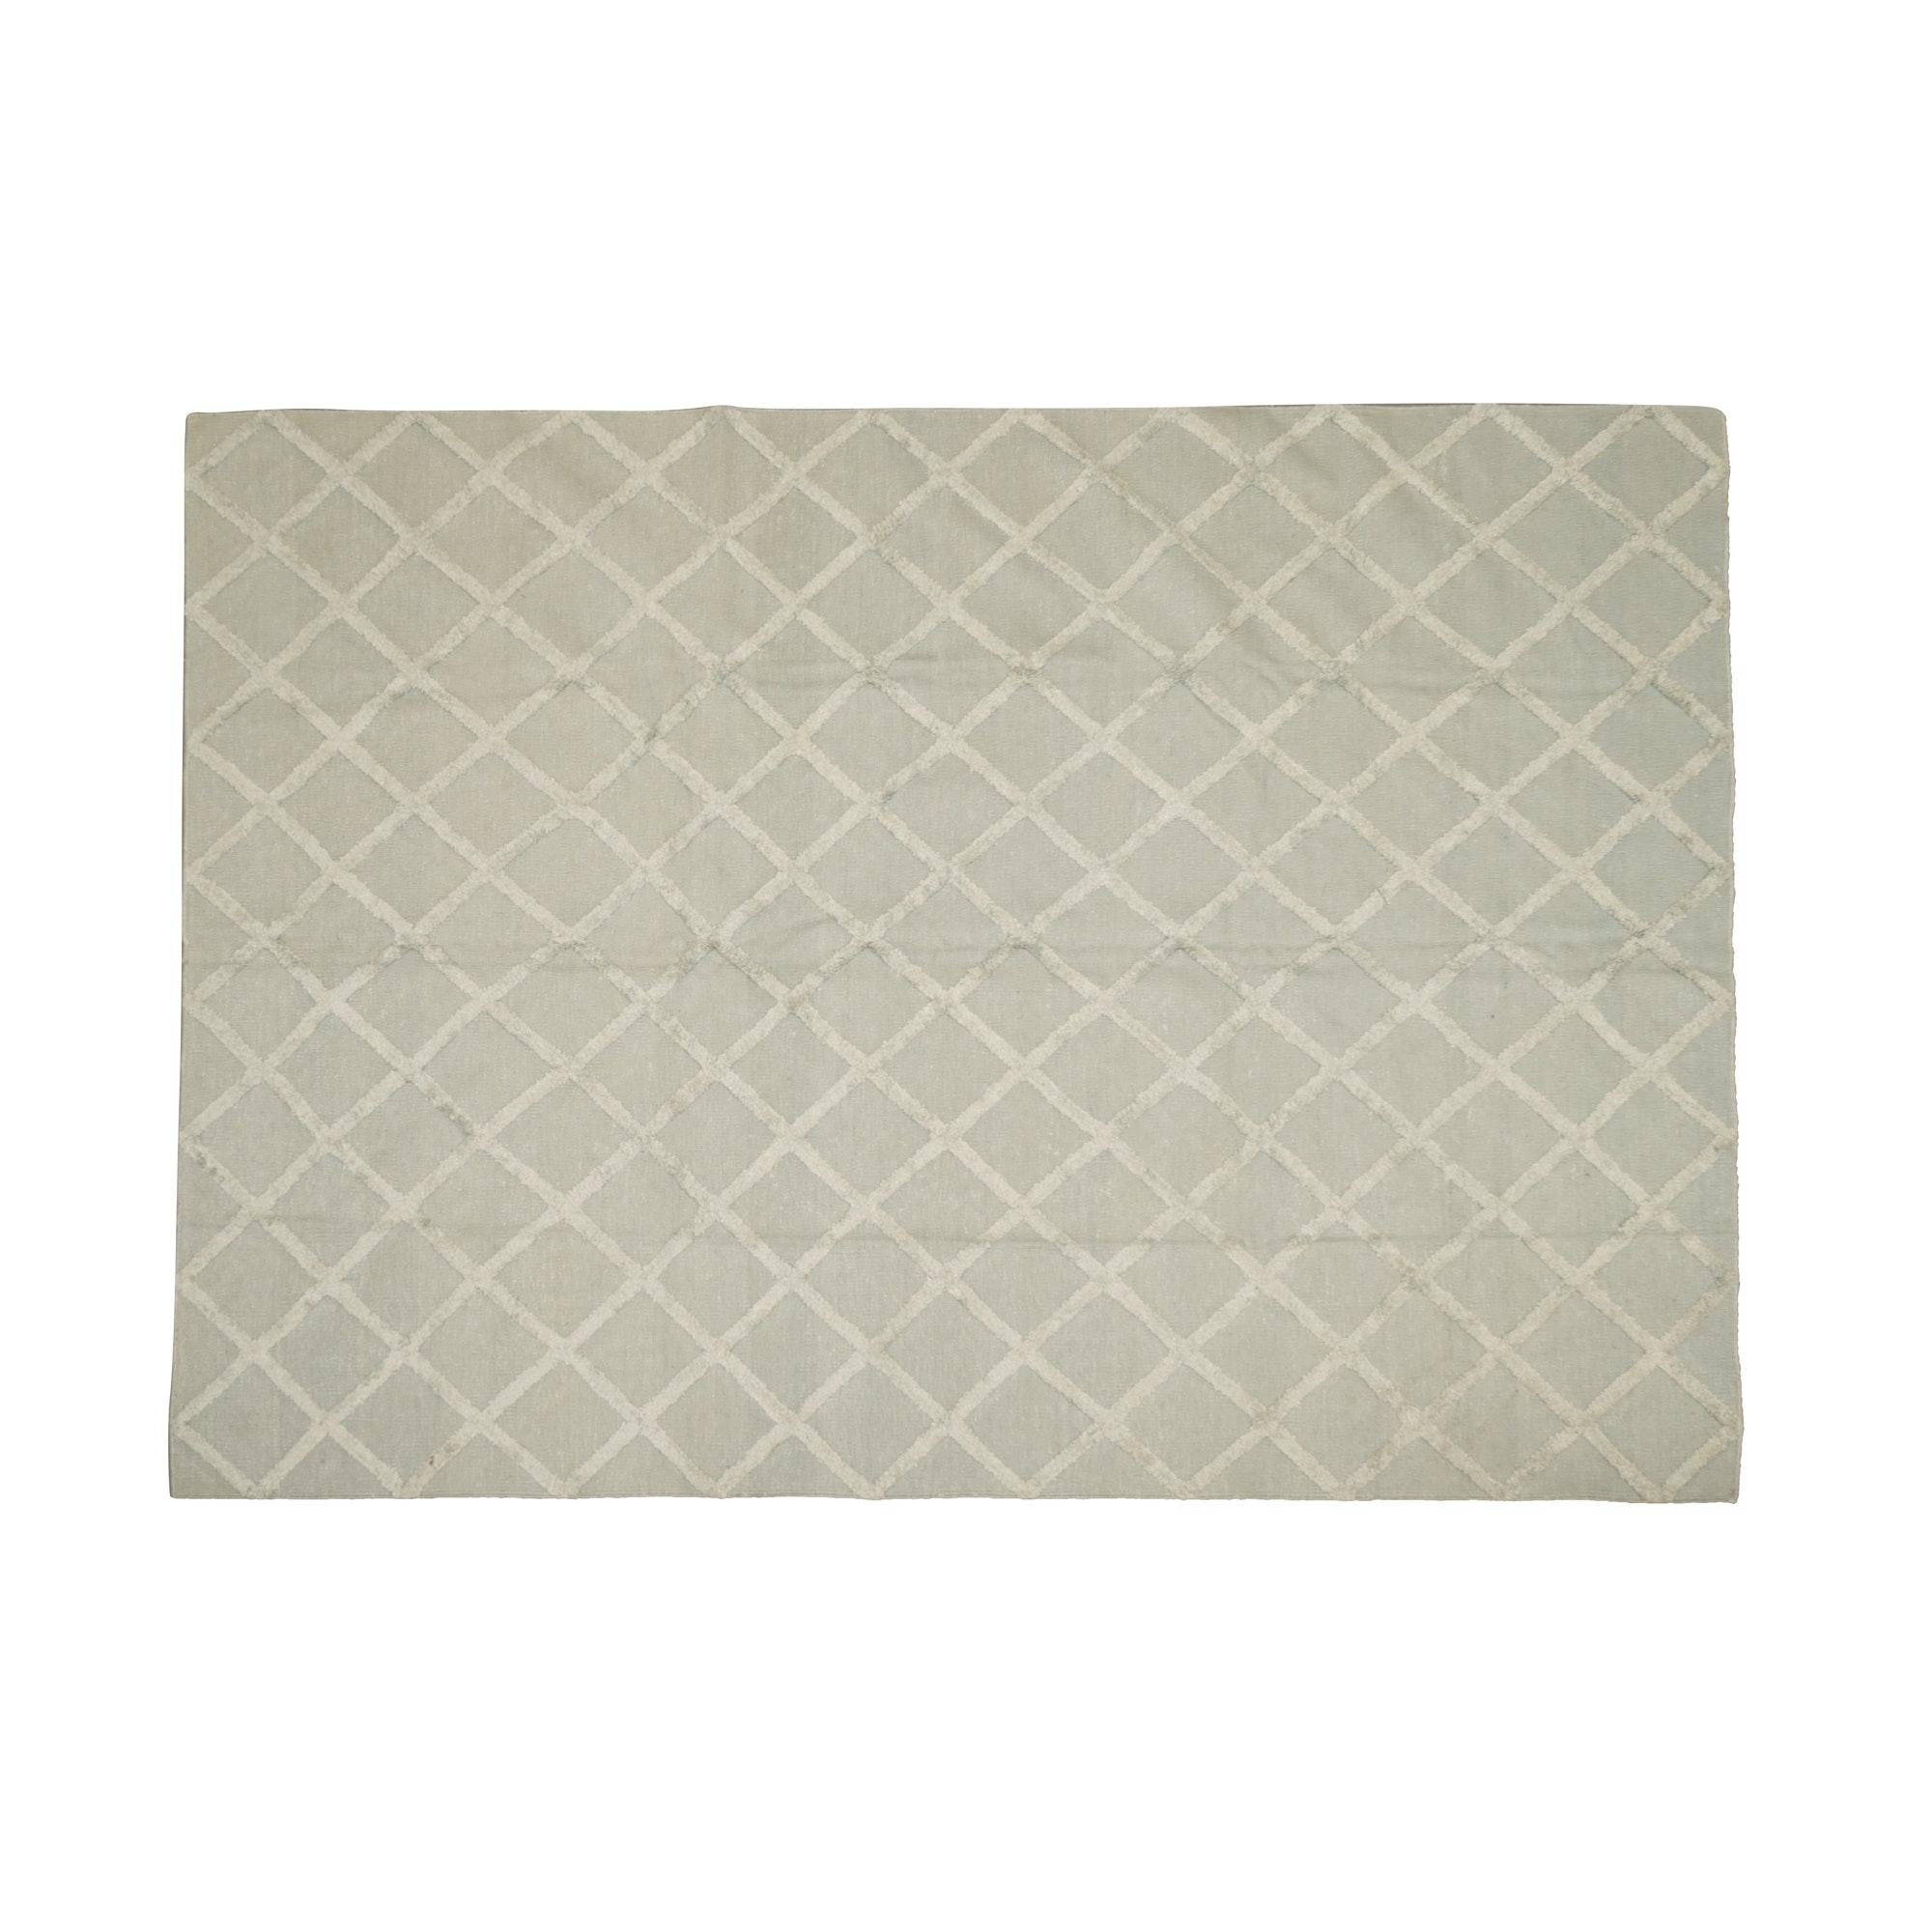 Handwoven Contemporary Textured Silk Area Rug